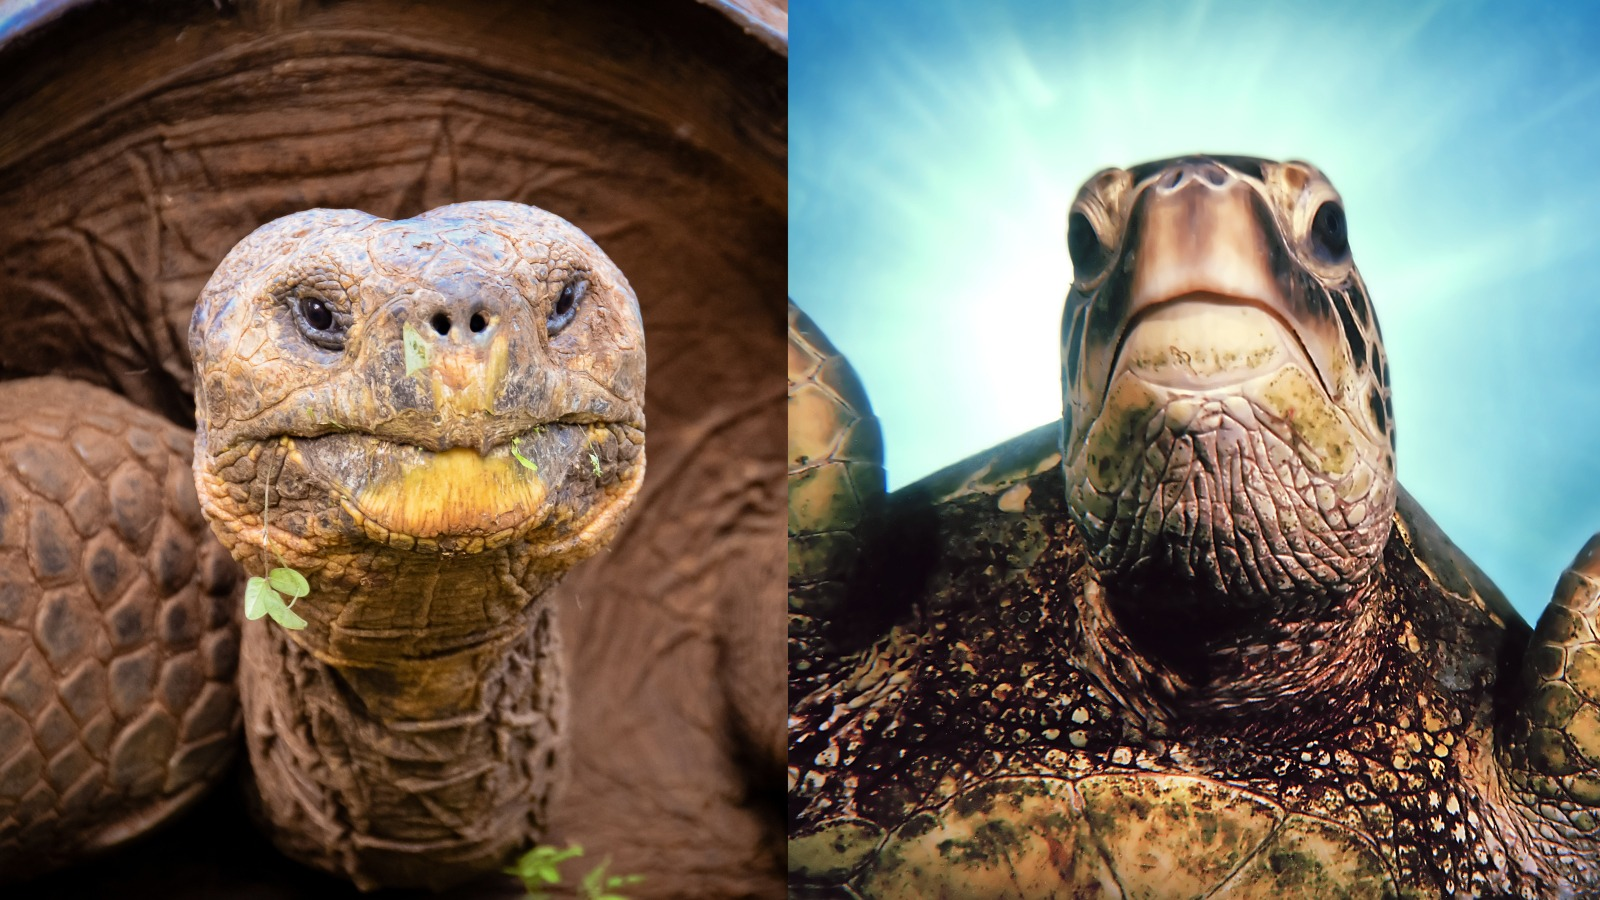 perbedaan moncong kura-kura vs. penyu